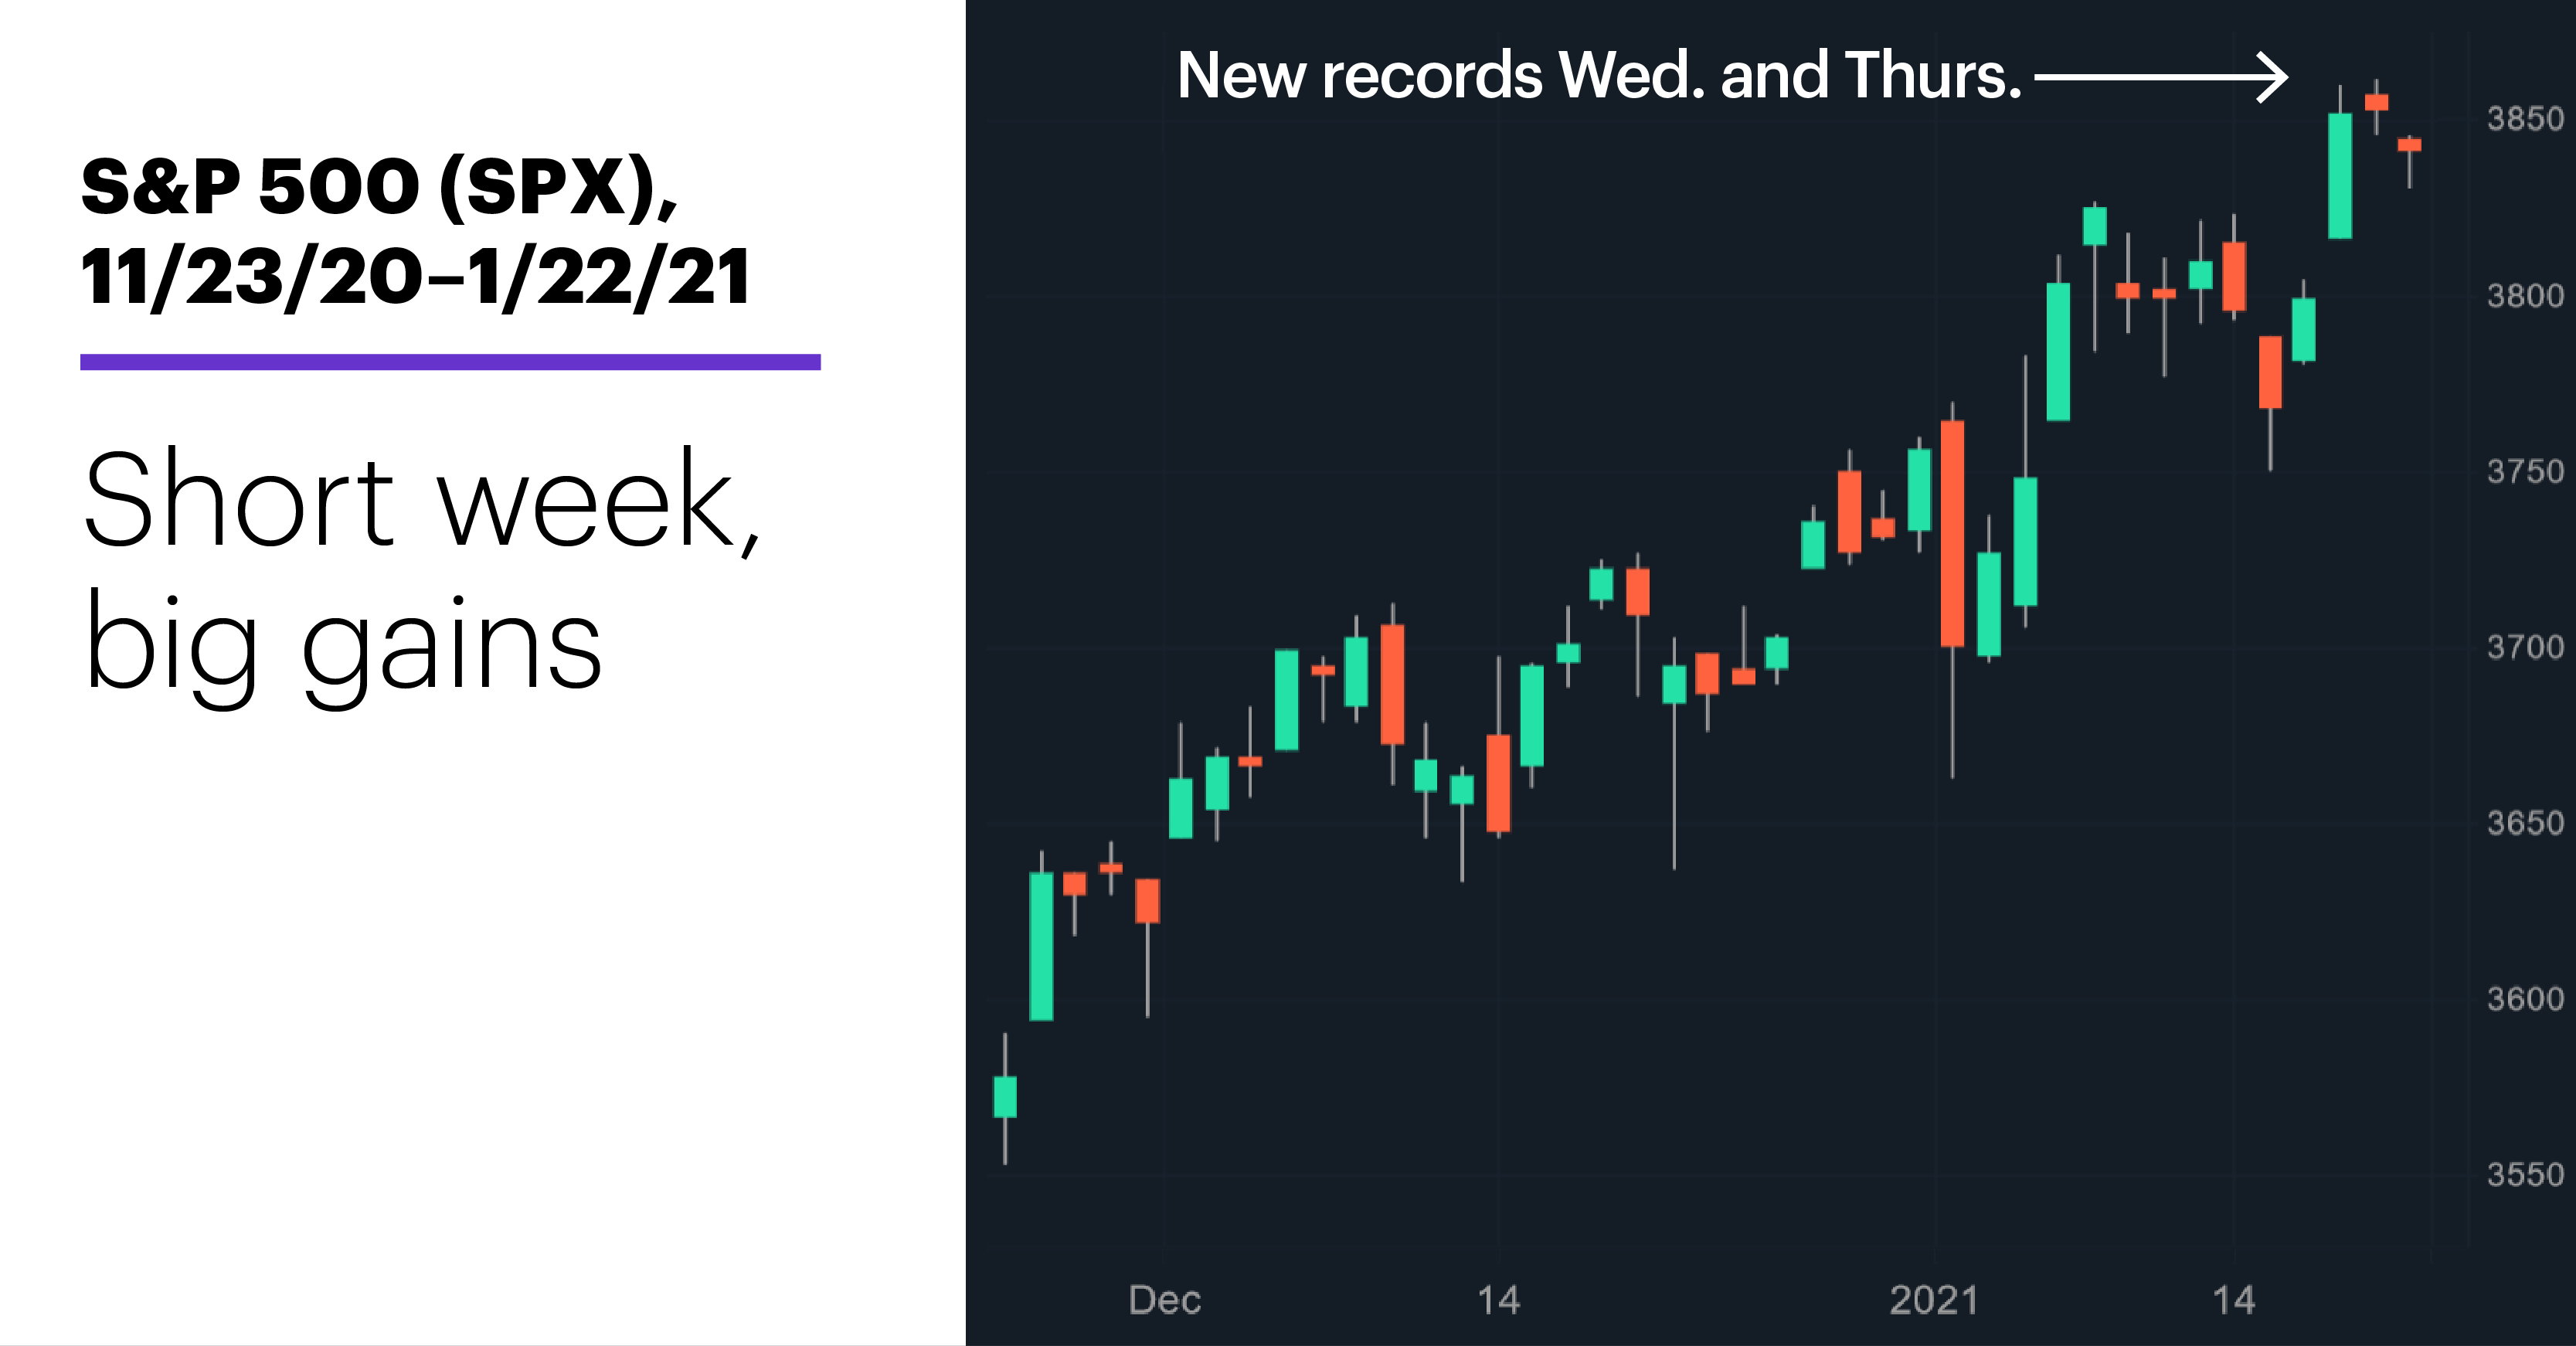 Chart 1: S&P 500 (SPX), 11/23/20–1/22/21. S&P 500 (SPX) price chart. Short week, big gains.